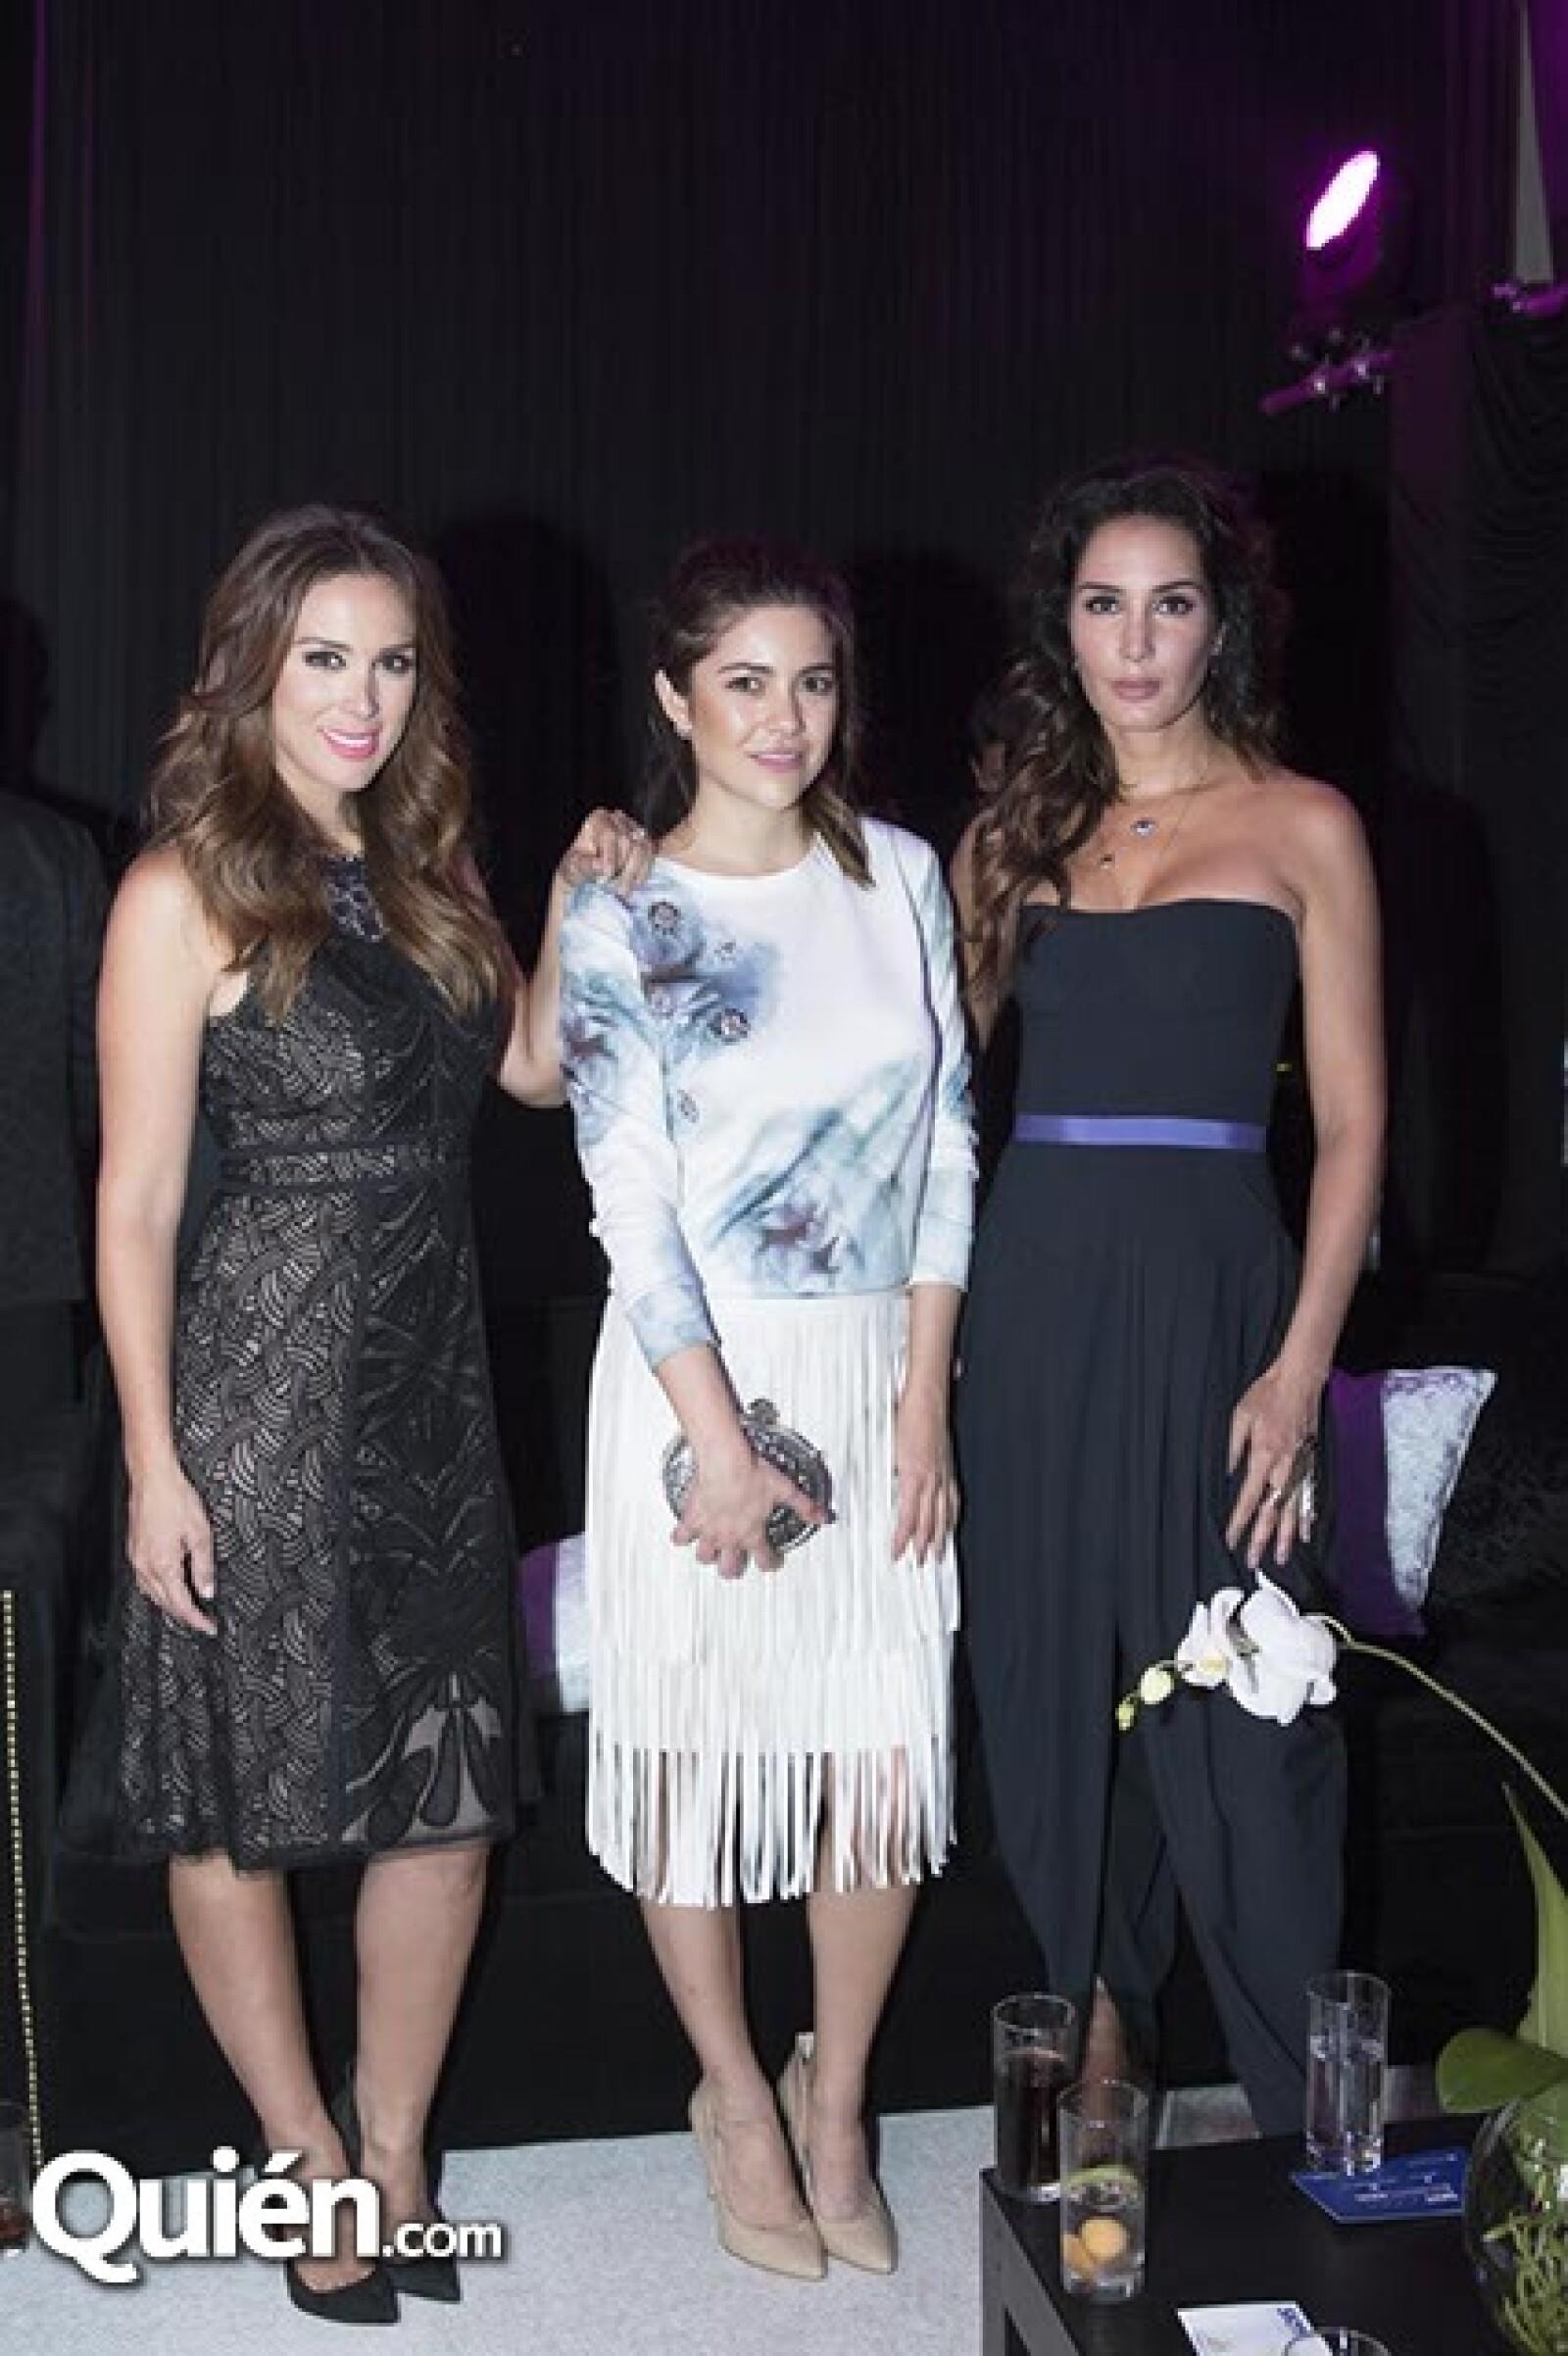 Jaqueline Bracamontes, Lorena Dominguez y Martha Cristiana